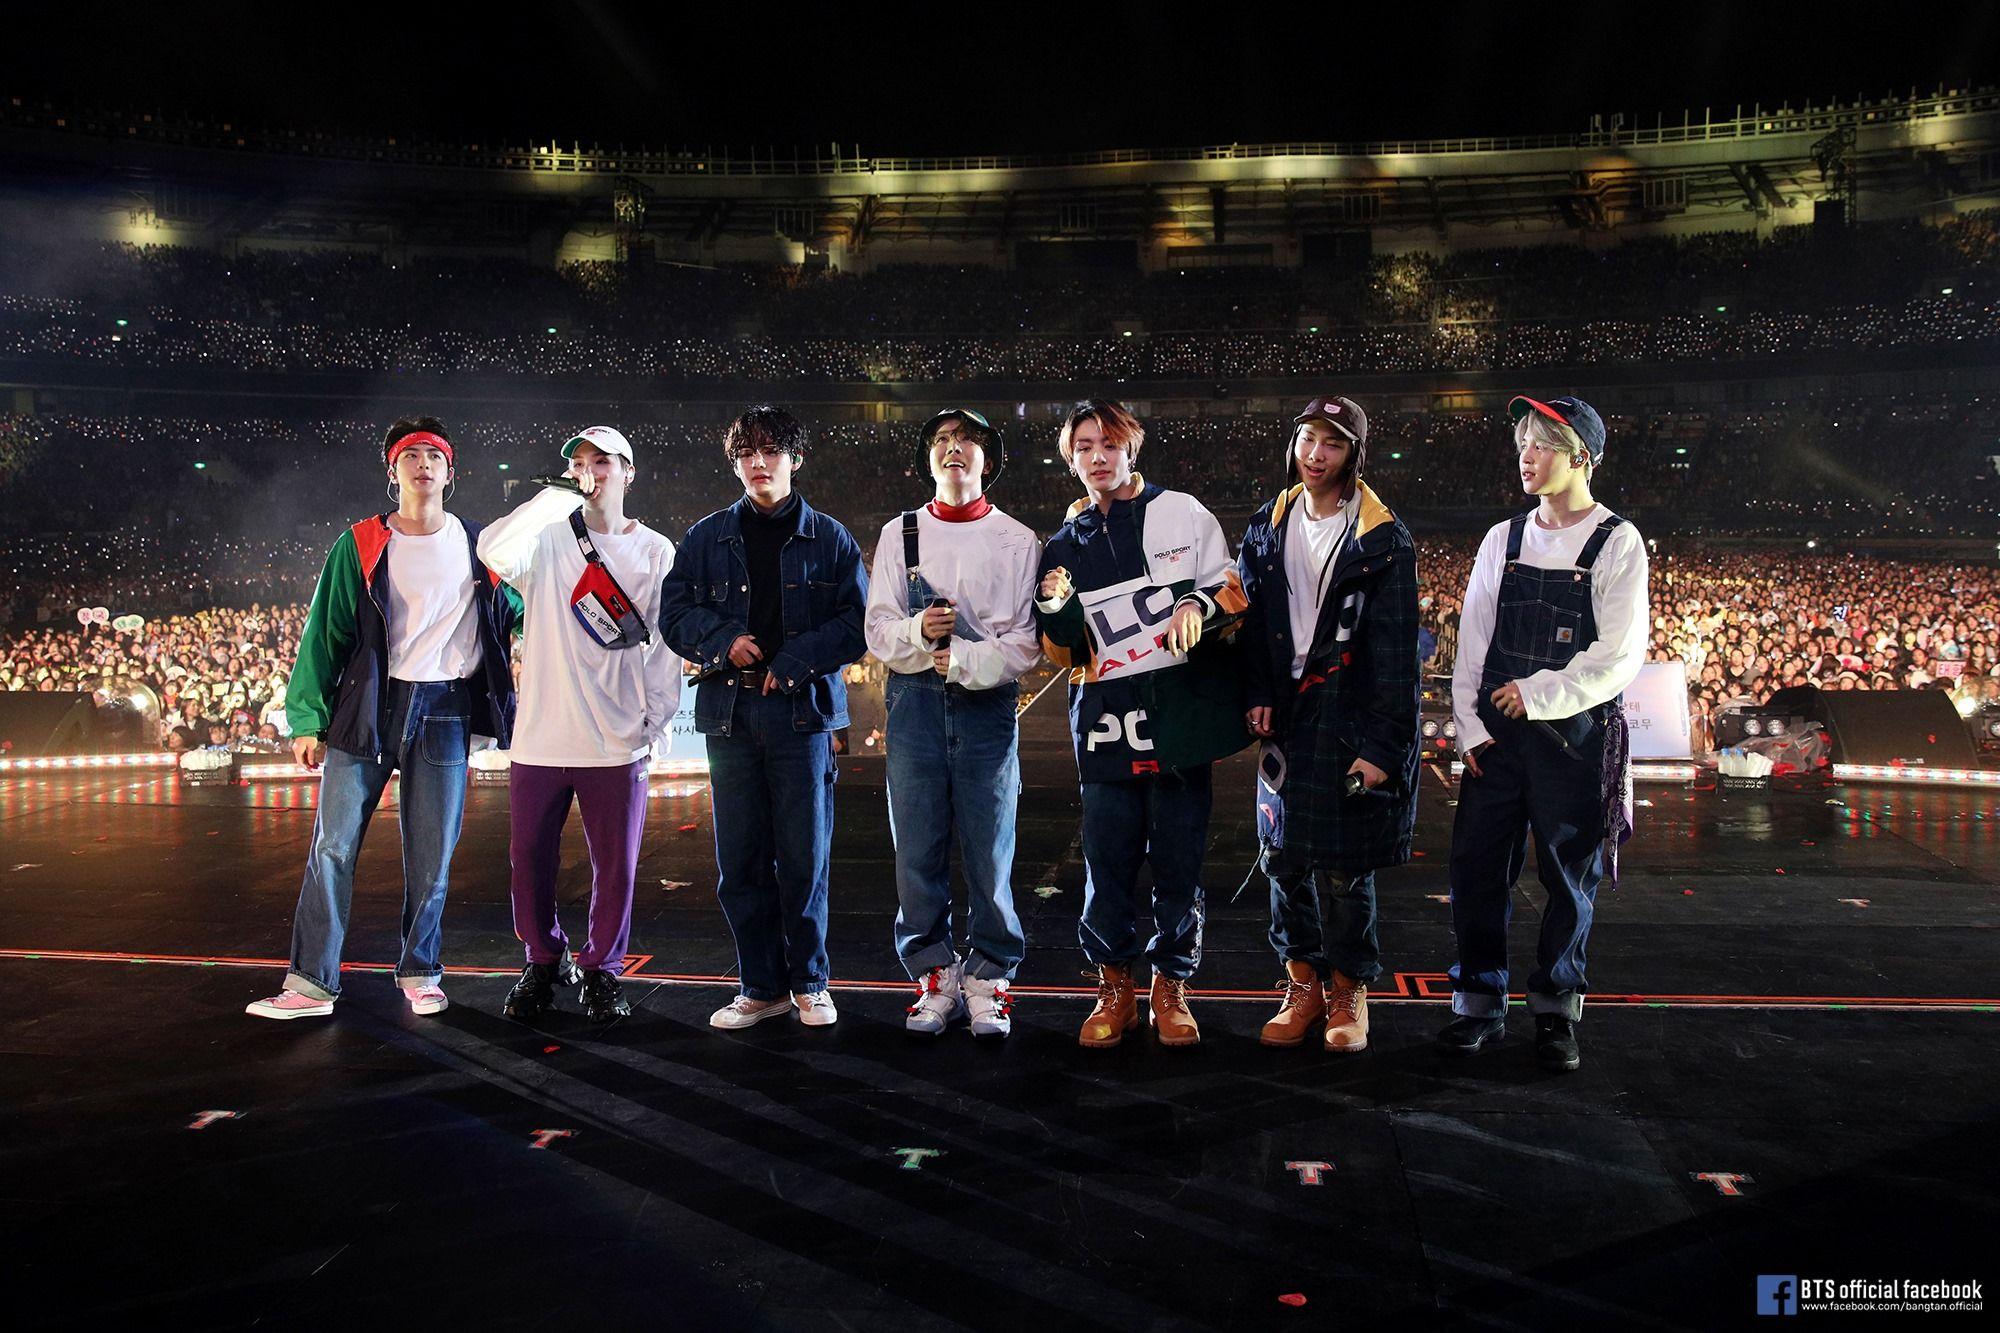 In concert | Photo: BTS Official Facebook